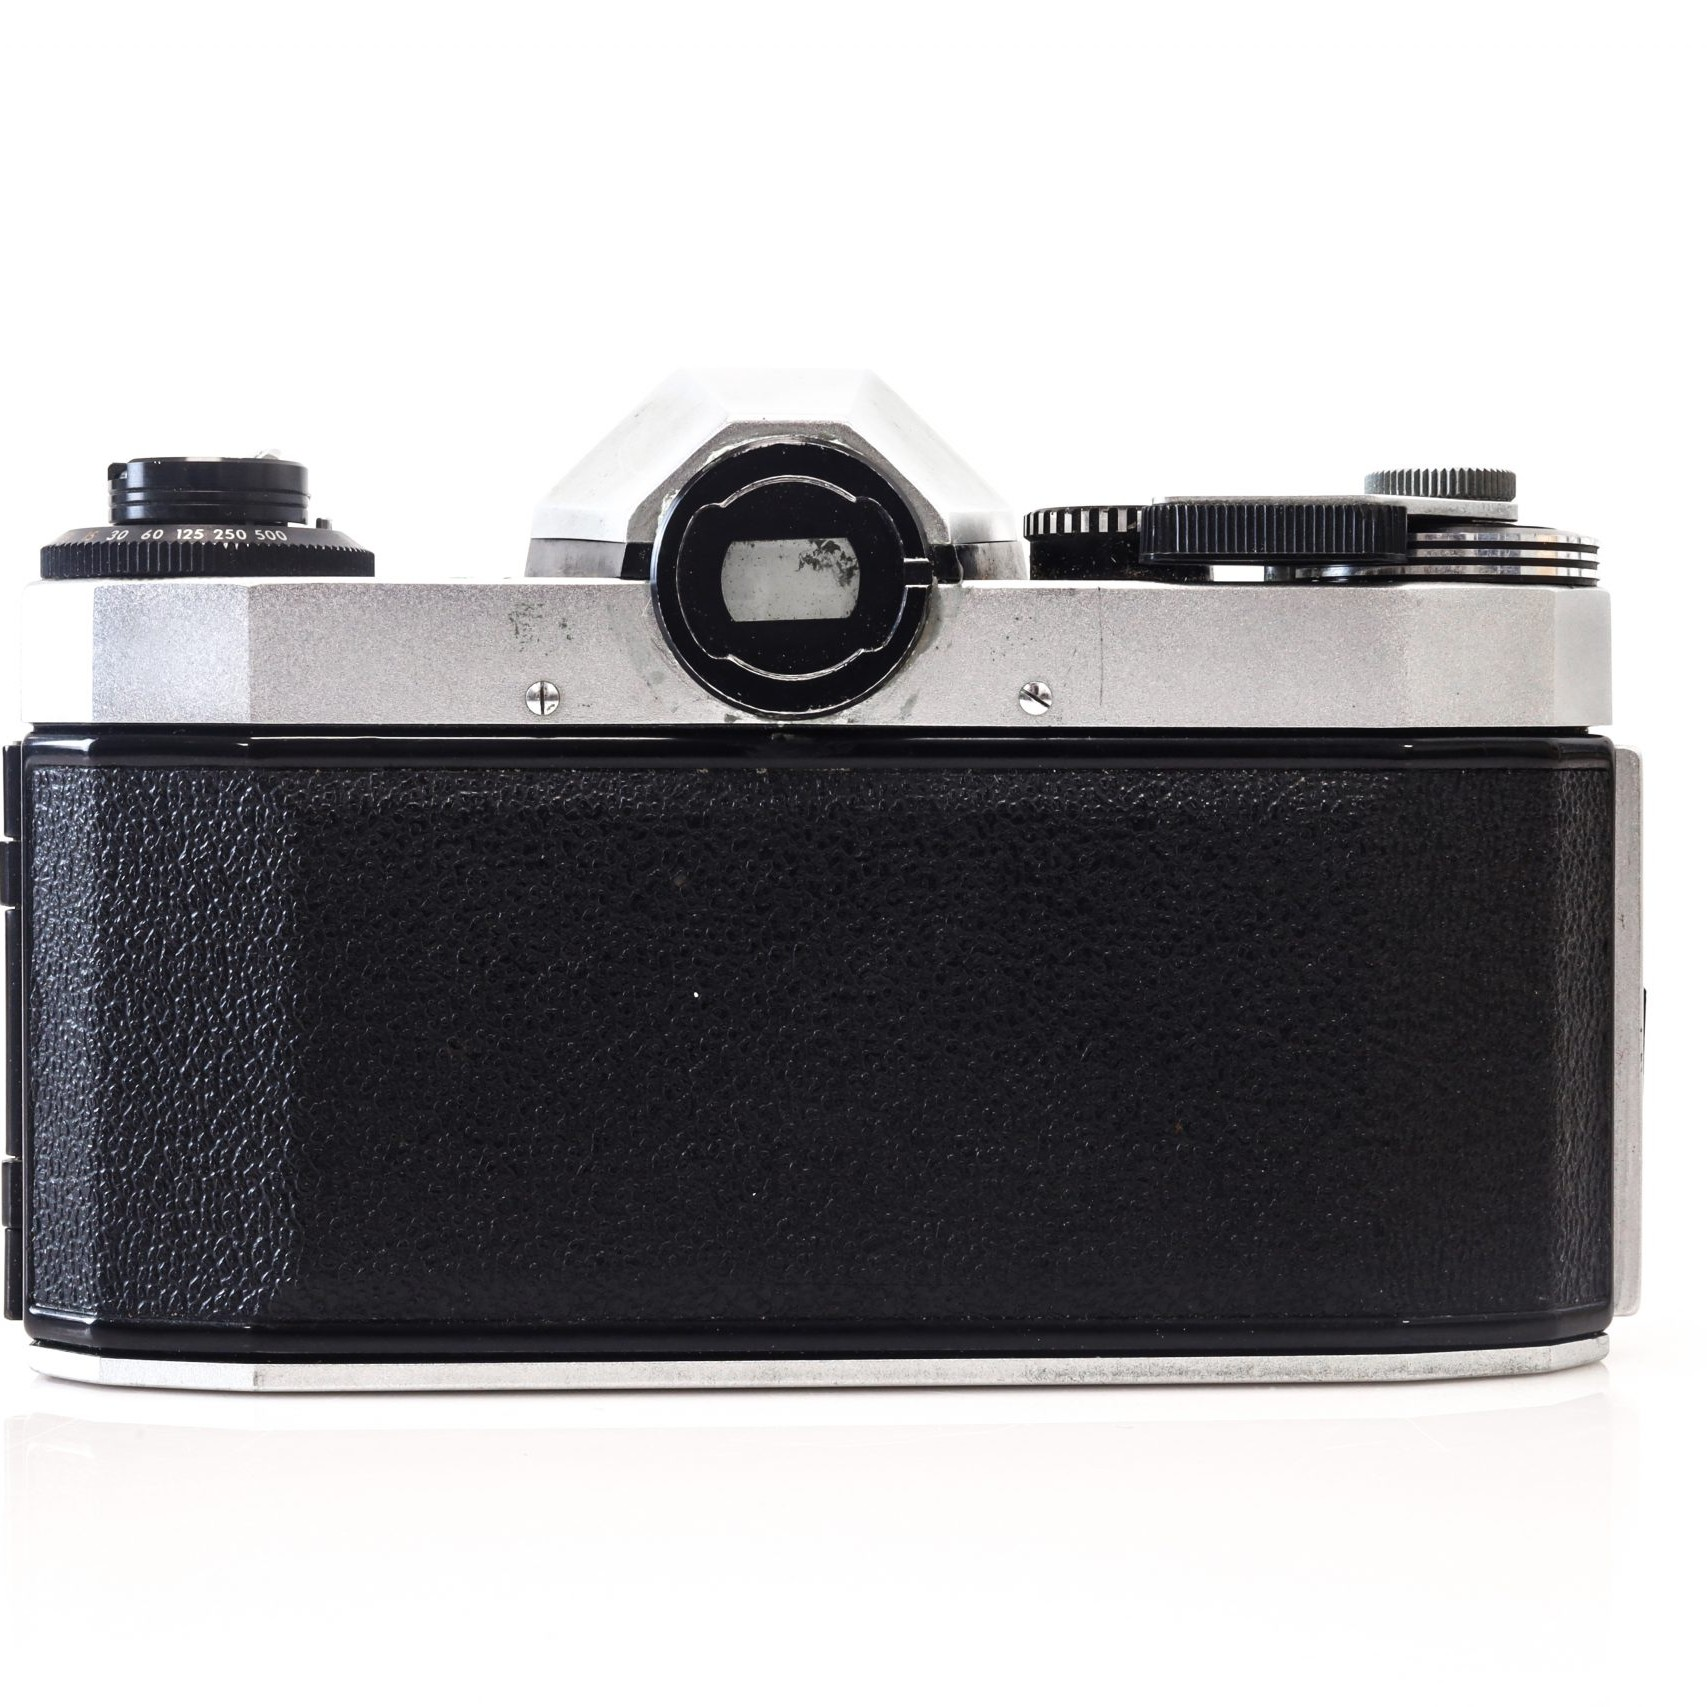 Brilliant Praktica PL Nova IB 35mm Film Camera with 2 Lenses